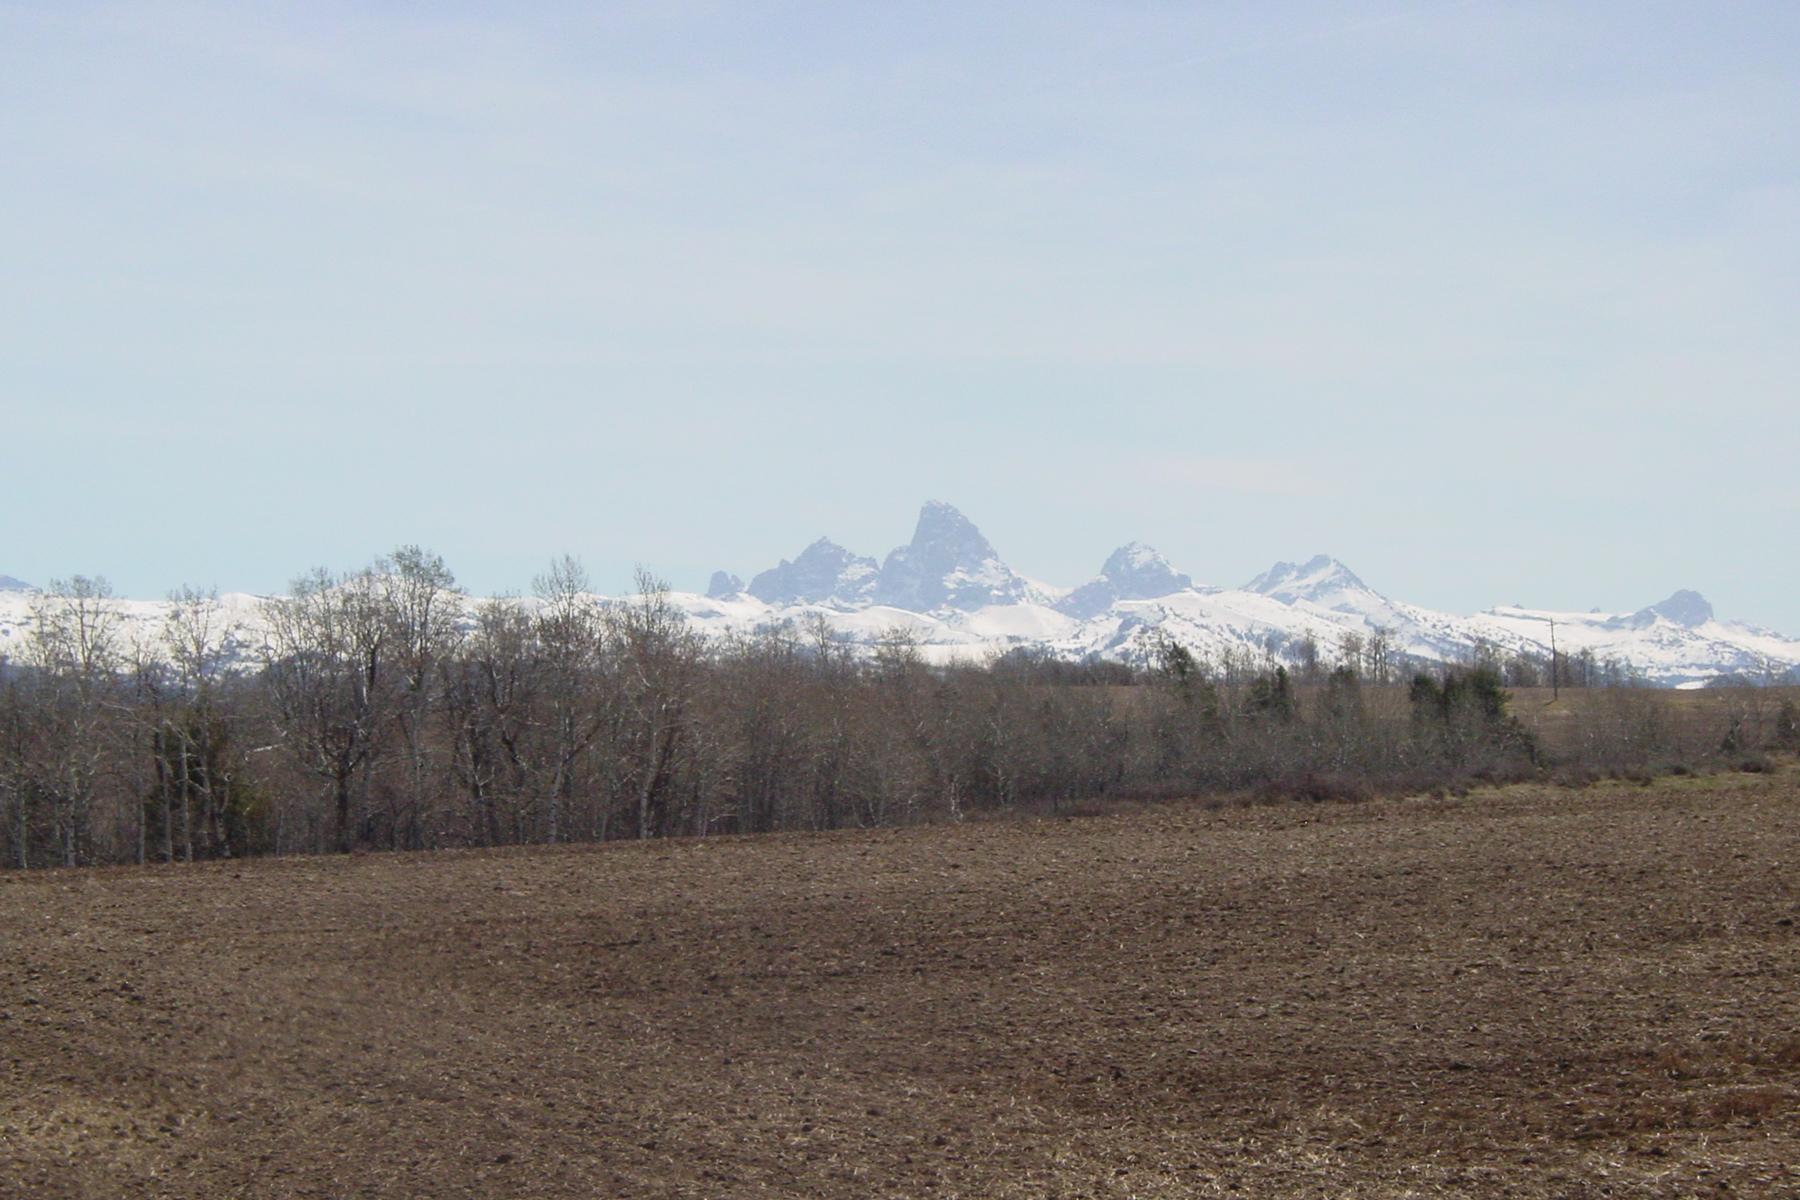 Land for Sale at Pristine 80 acre parcel near Bitch Creek 14250 N 5000 W, Felt, Idaho, 83424 Jackson Hole, United States